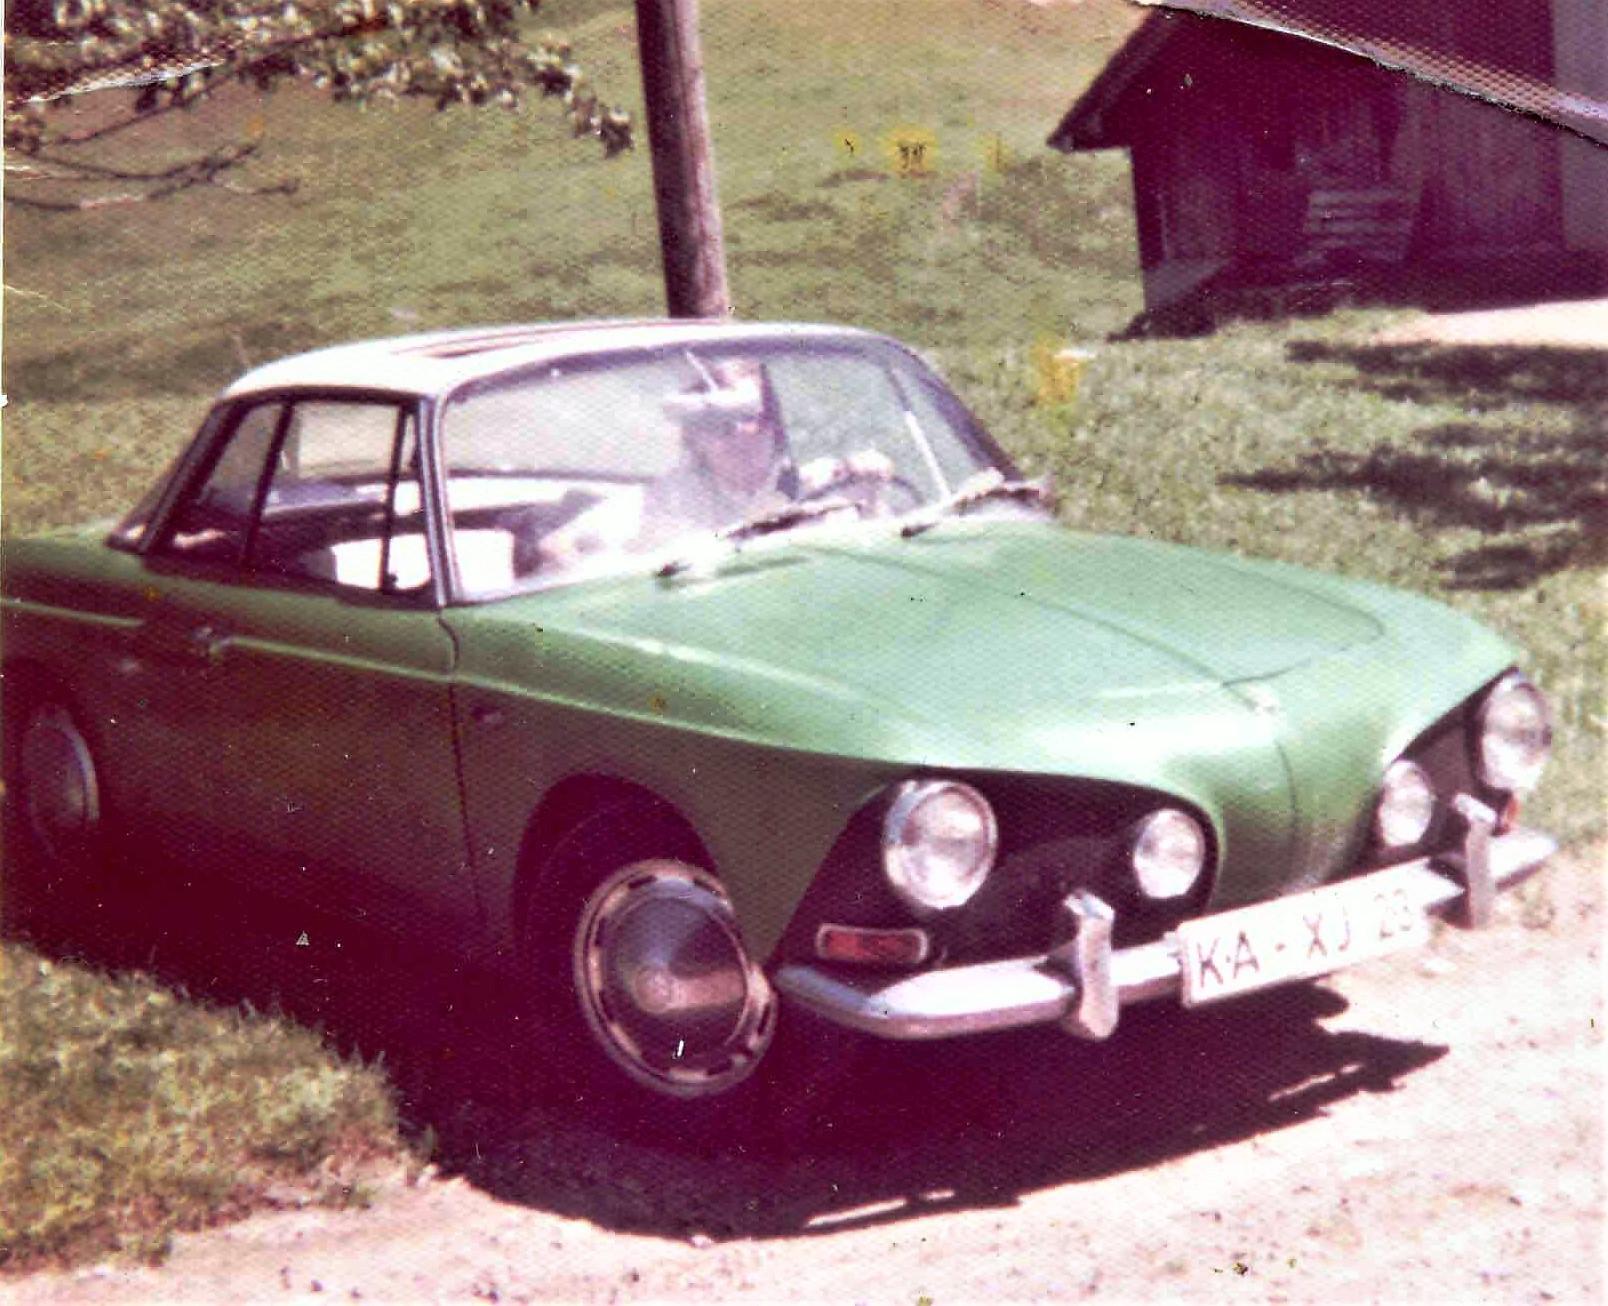 Huberts Besonderer Laden Fr Alte 100 Oktan Kisten 1975 Volkswagen Karmann Ghia Morschach